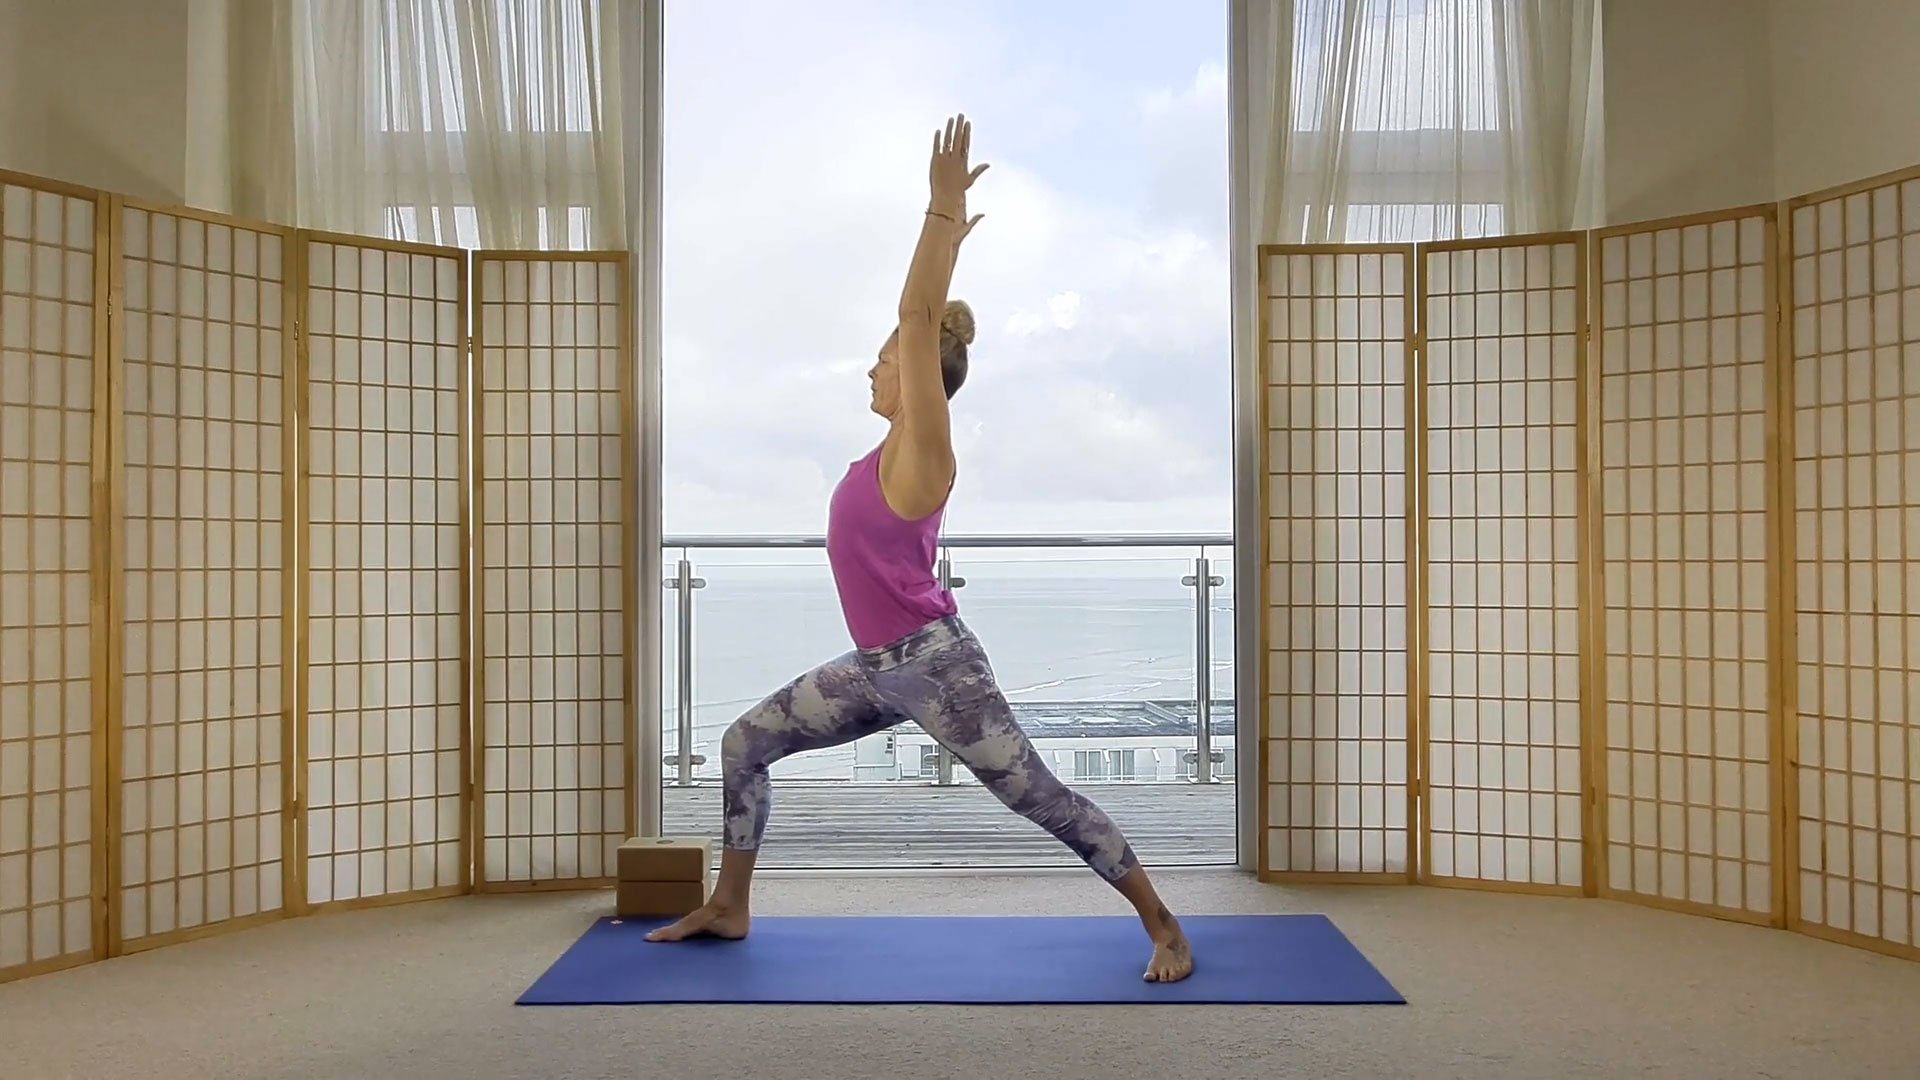 Sunrise yoga flow online on demand class waking up